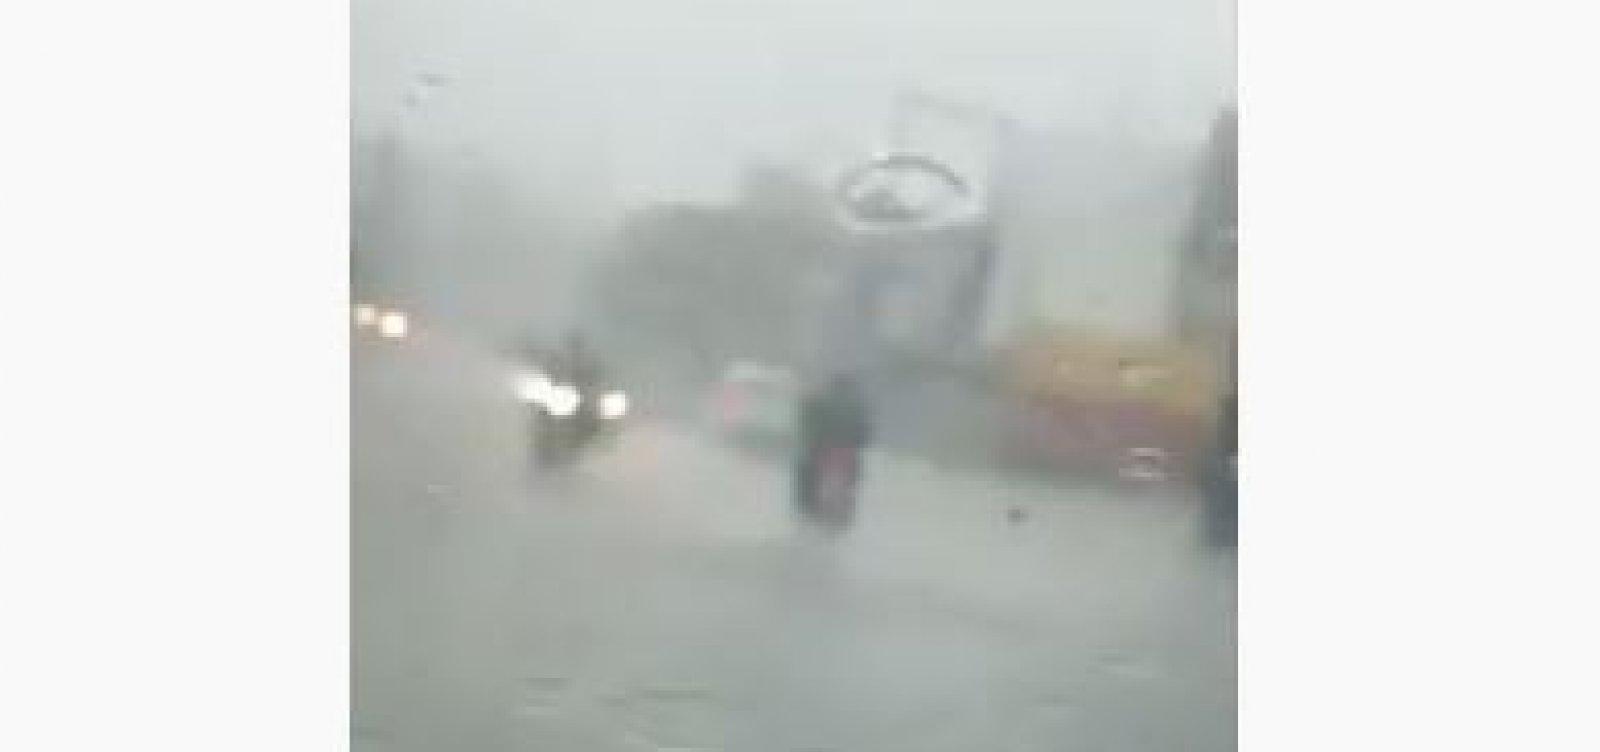 Dilúvio provoca alagamentos na avenida San Martin; veja vídeo